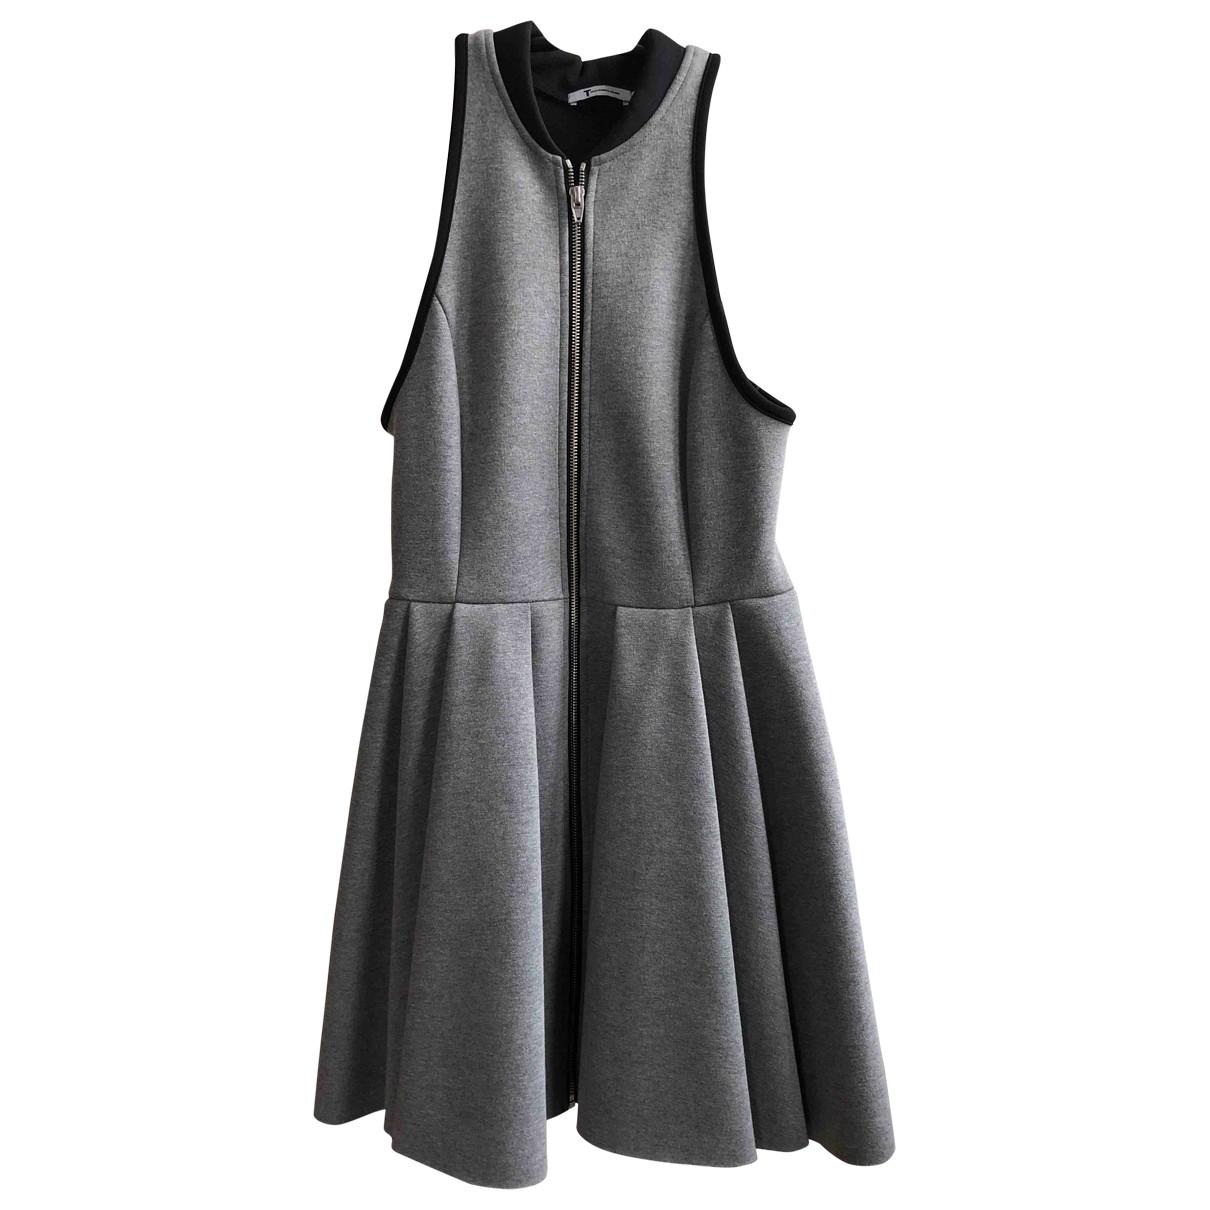 T By Alexander Wang \N Grey dress for Women M International